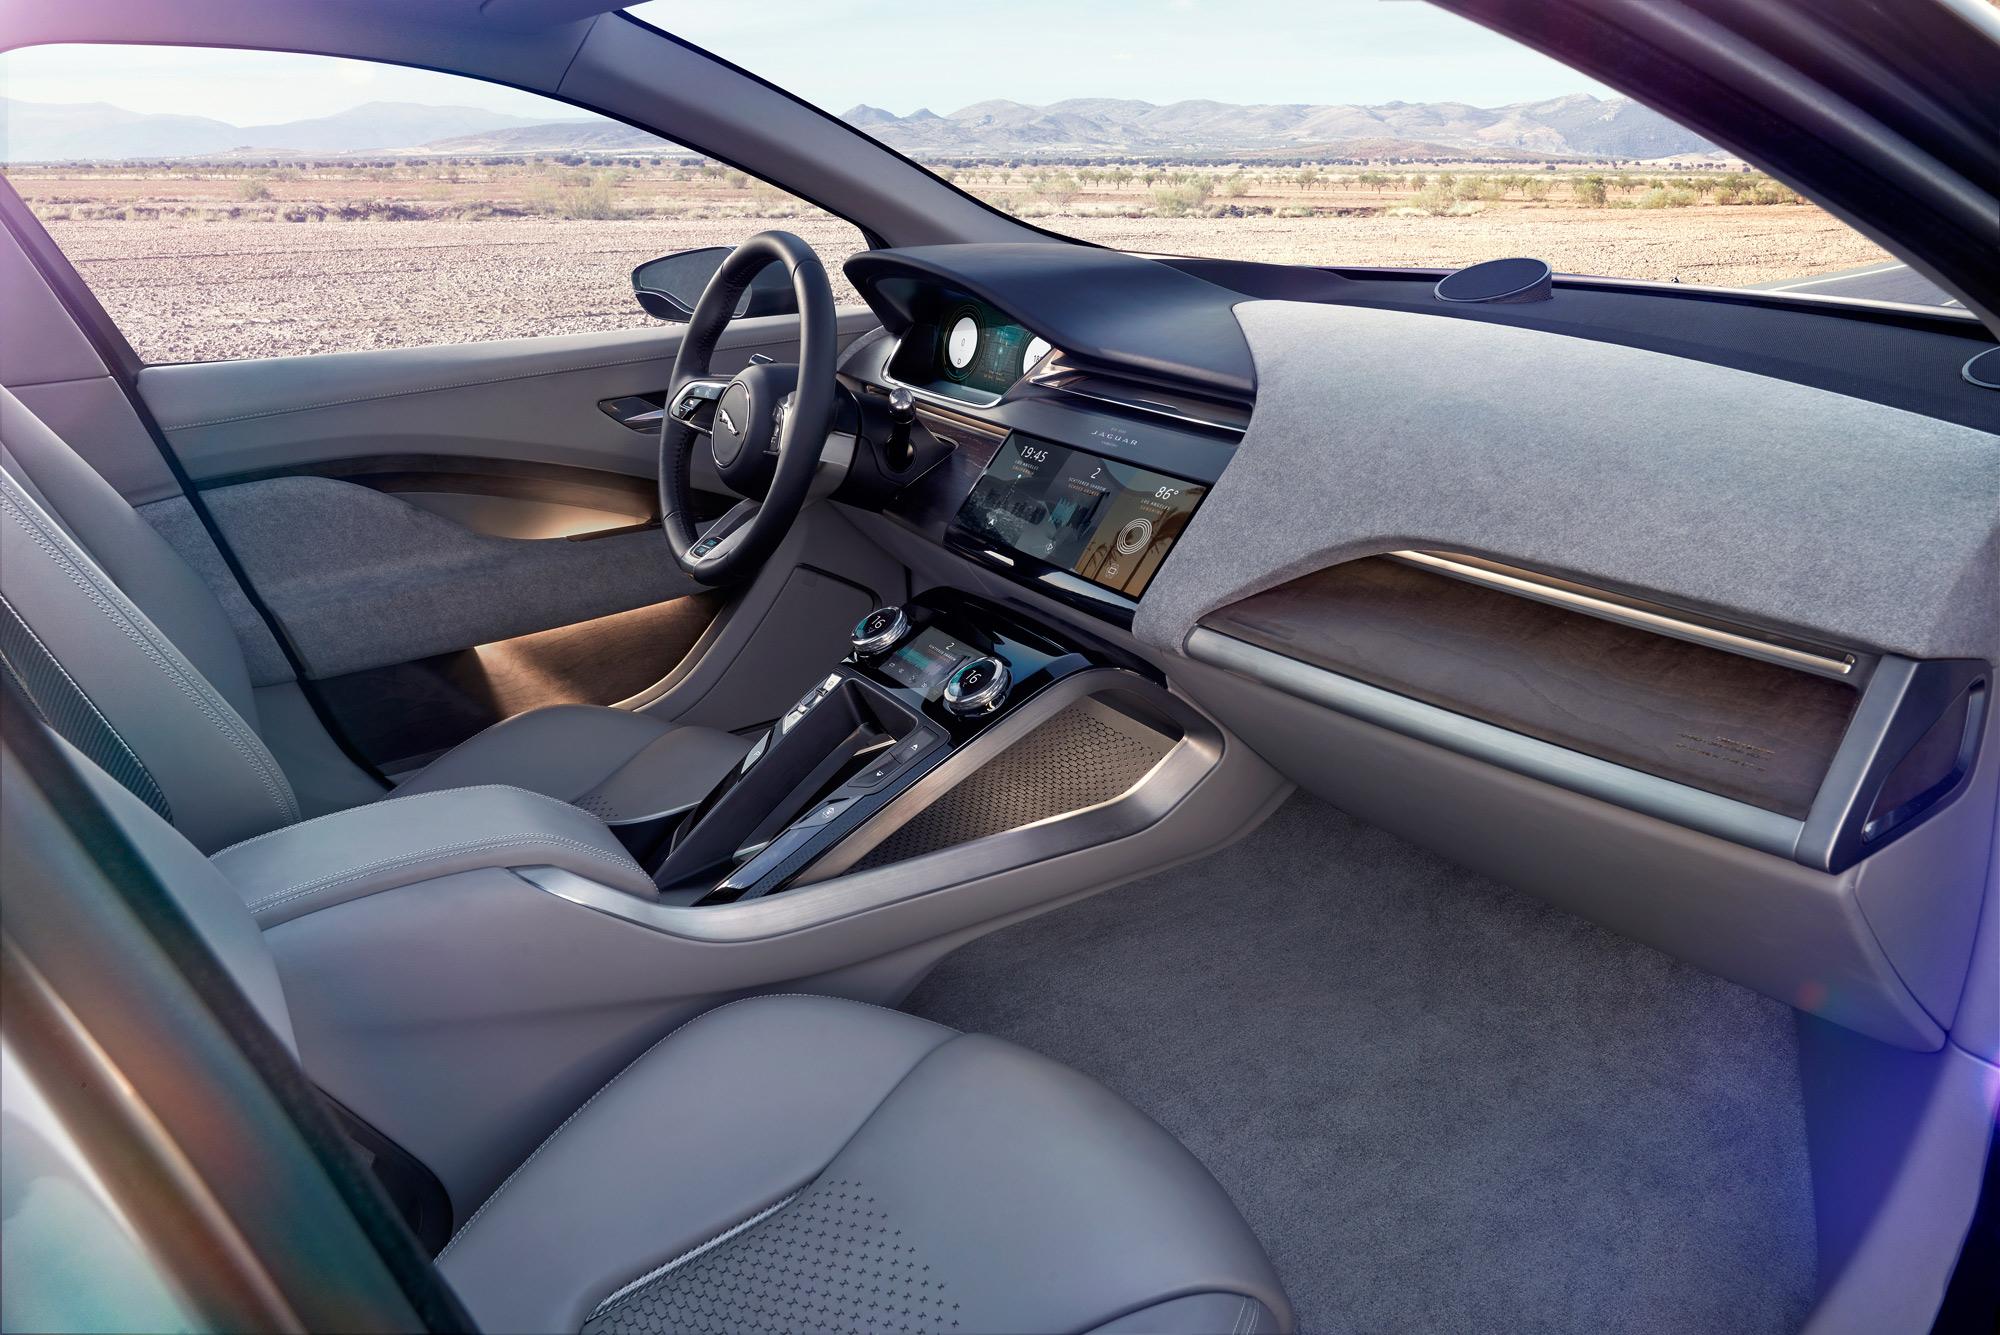 Jaguar I-PACE Concept interior